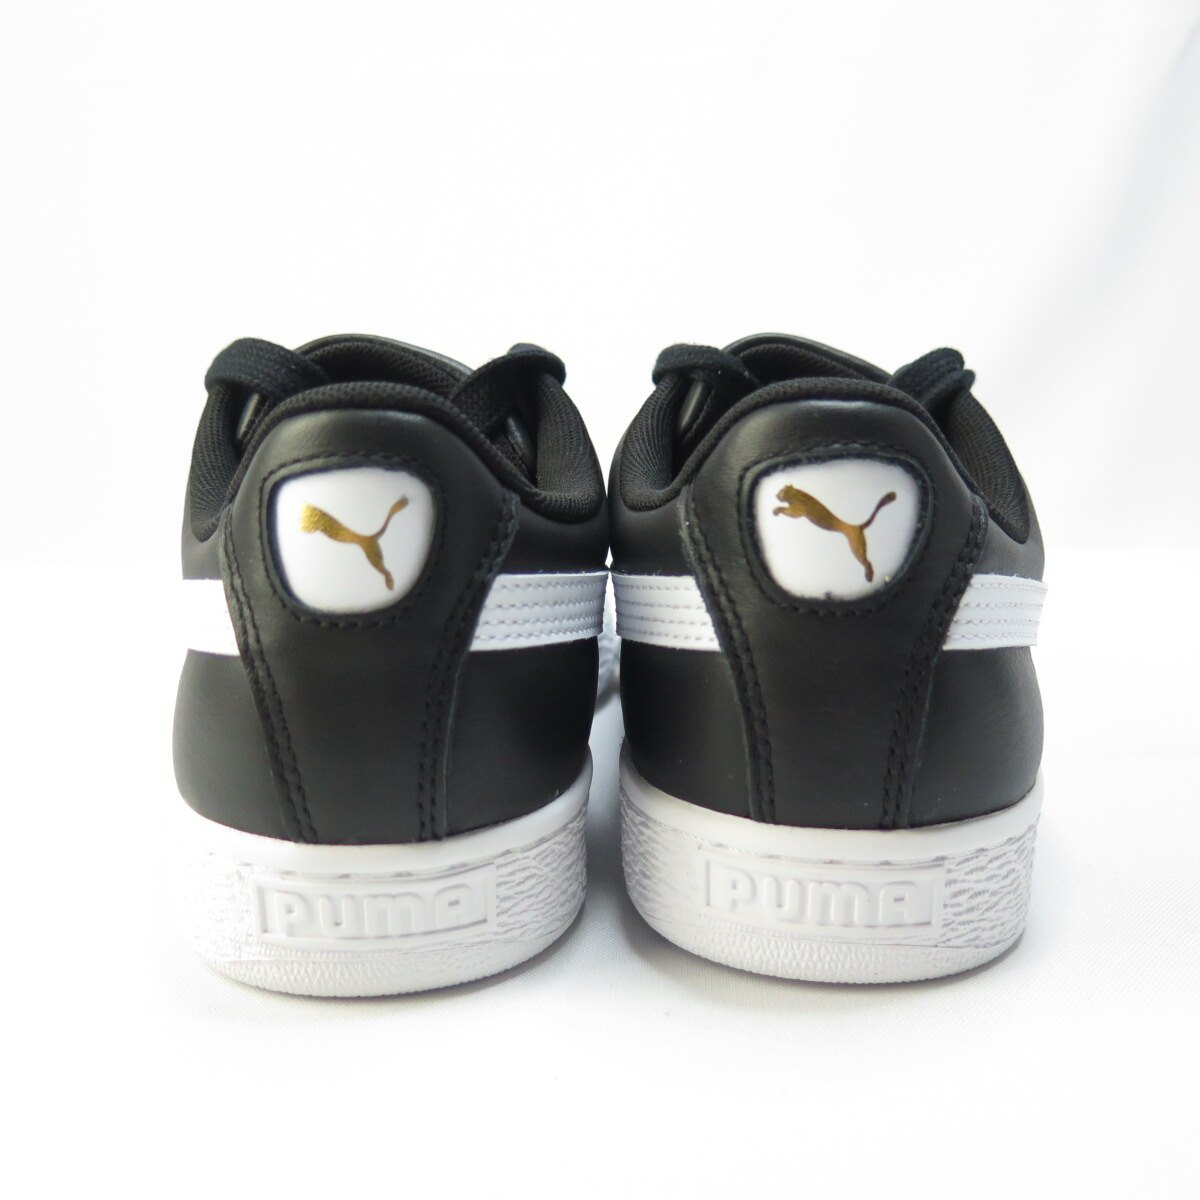 PUMA BASKET CLASSIC LFS 休閒鞋 正品 35436721 男款 黑【iSport愛運動】